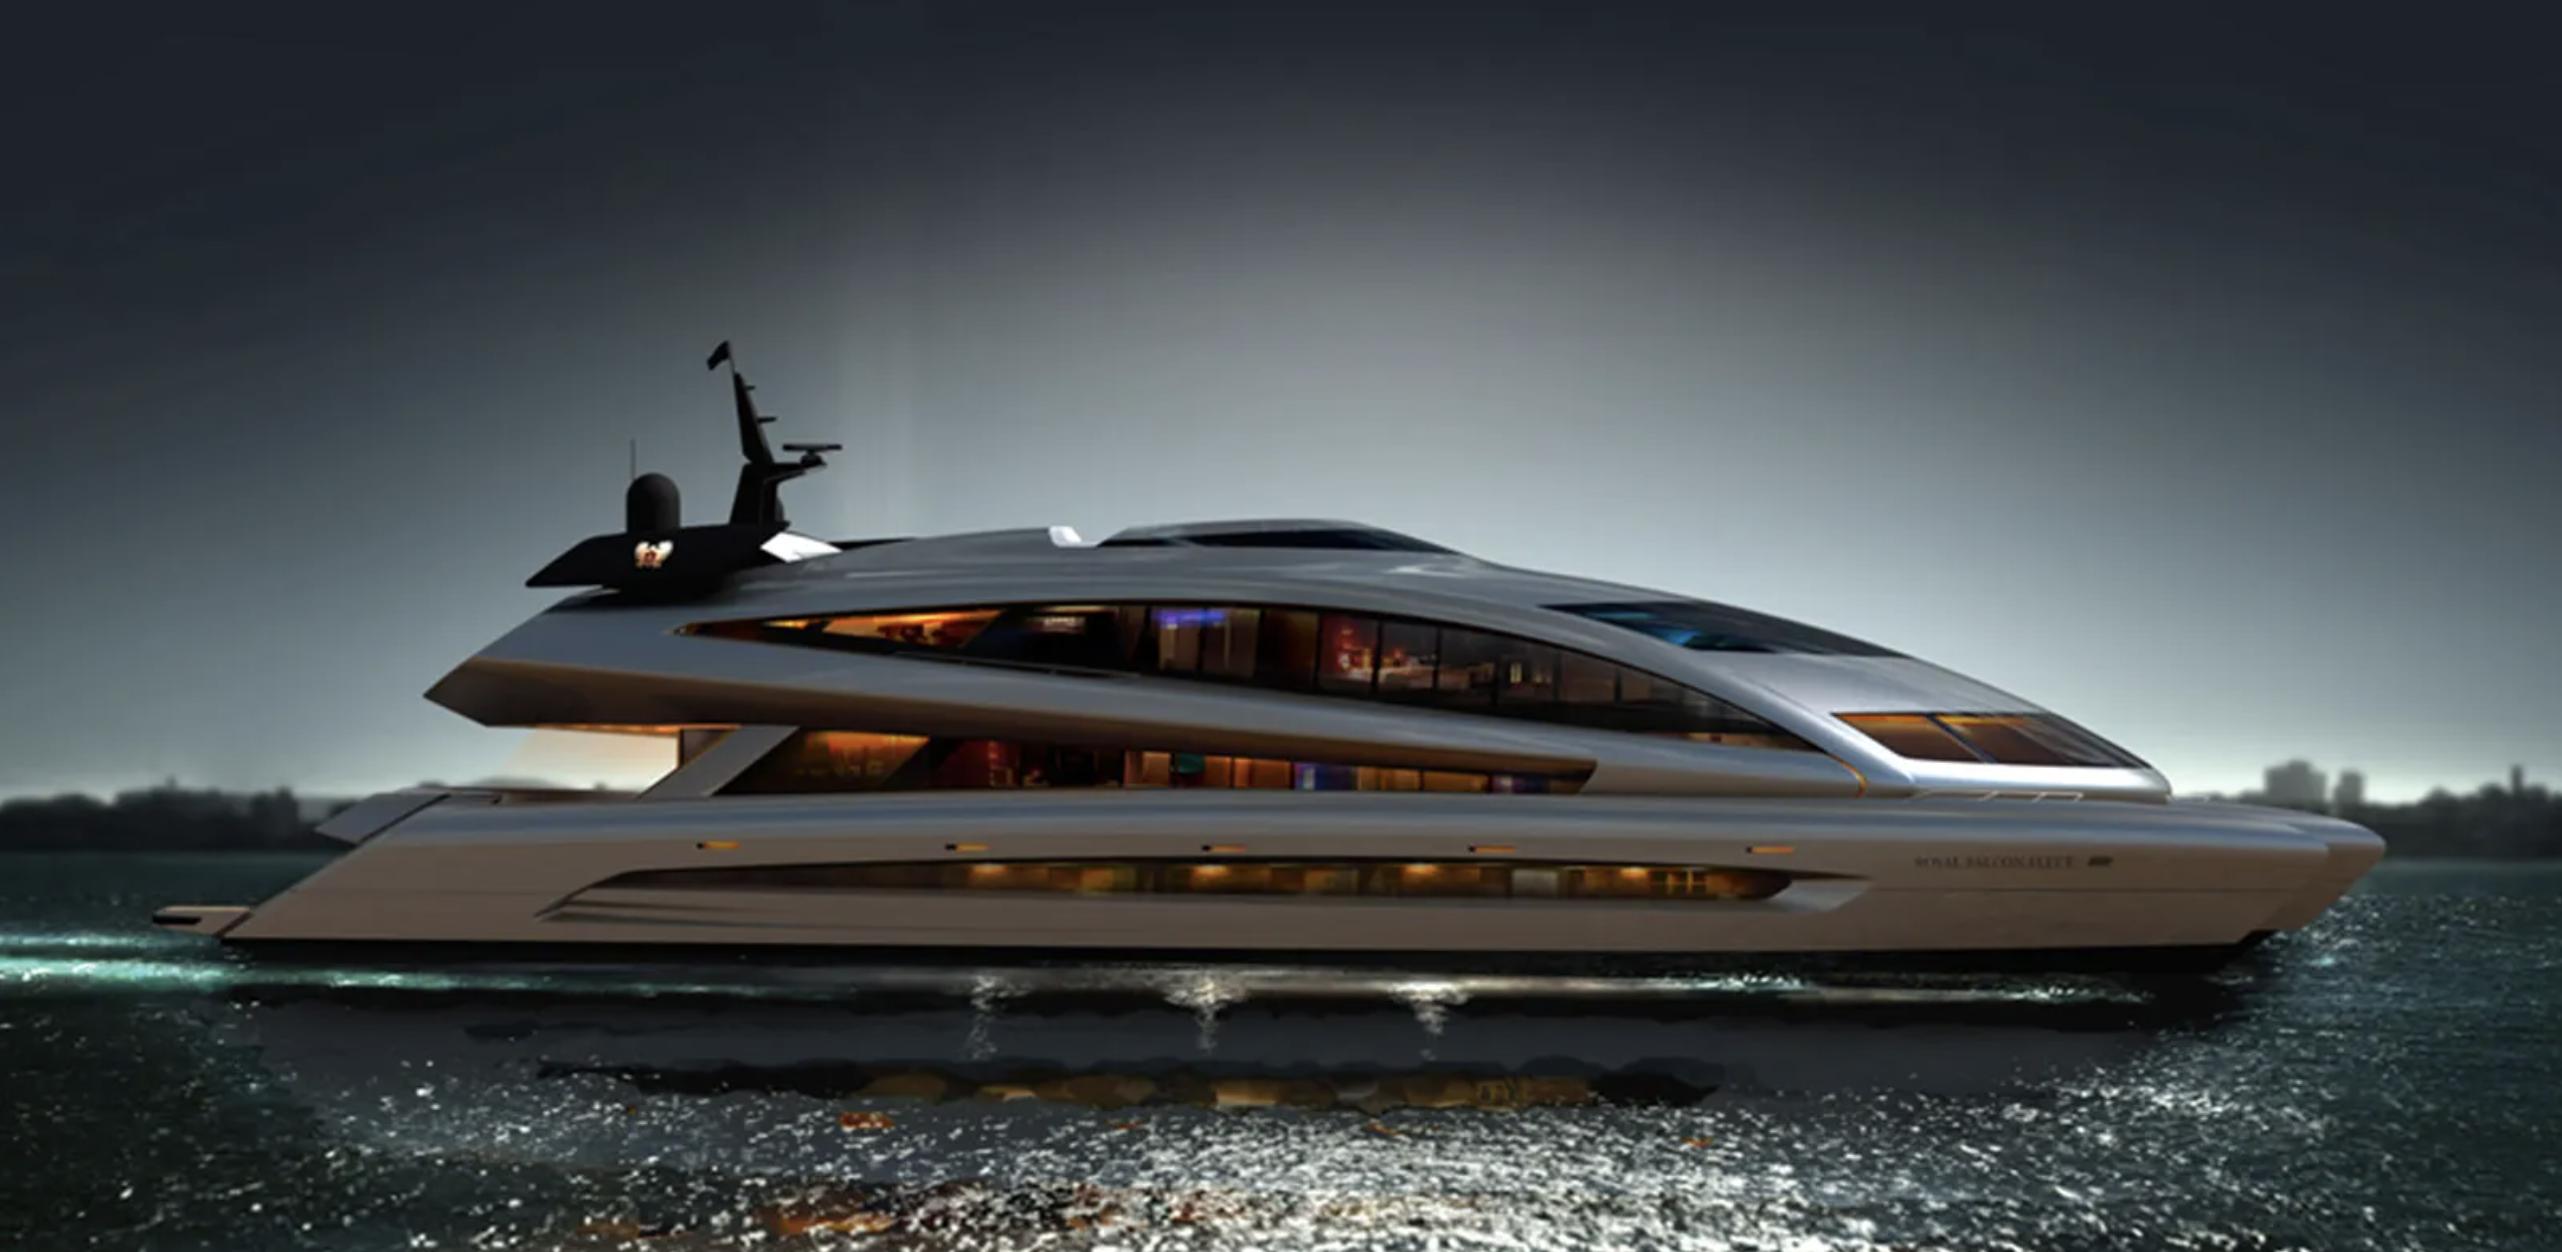 RFF135-Porsche-Design-catamaran-Moncada-Yachts